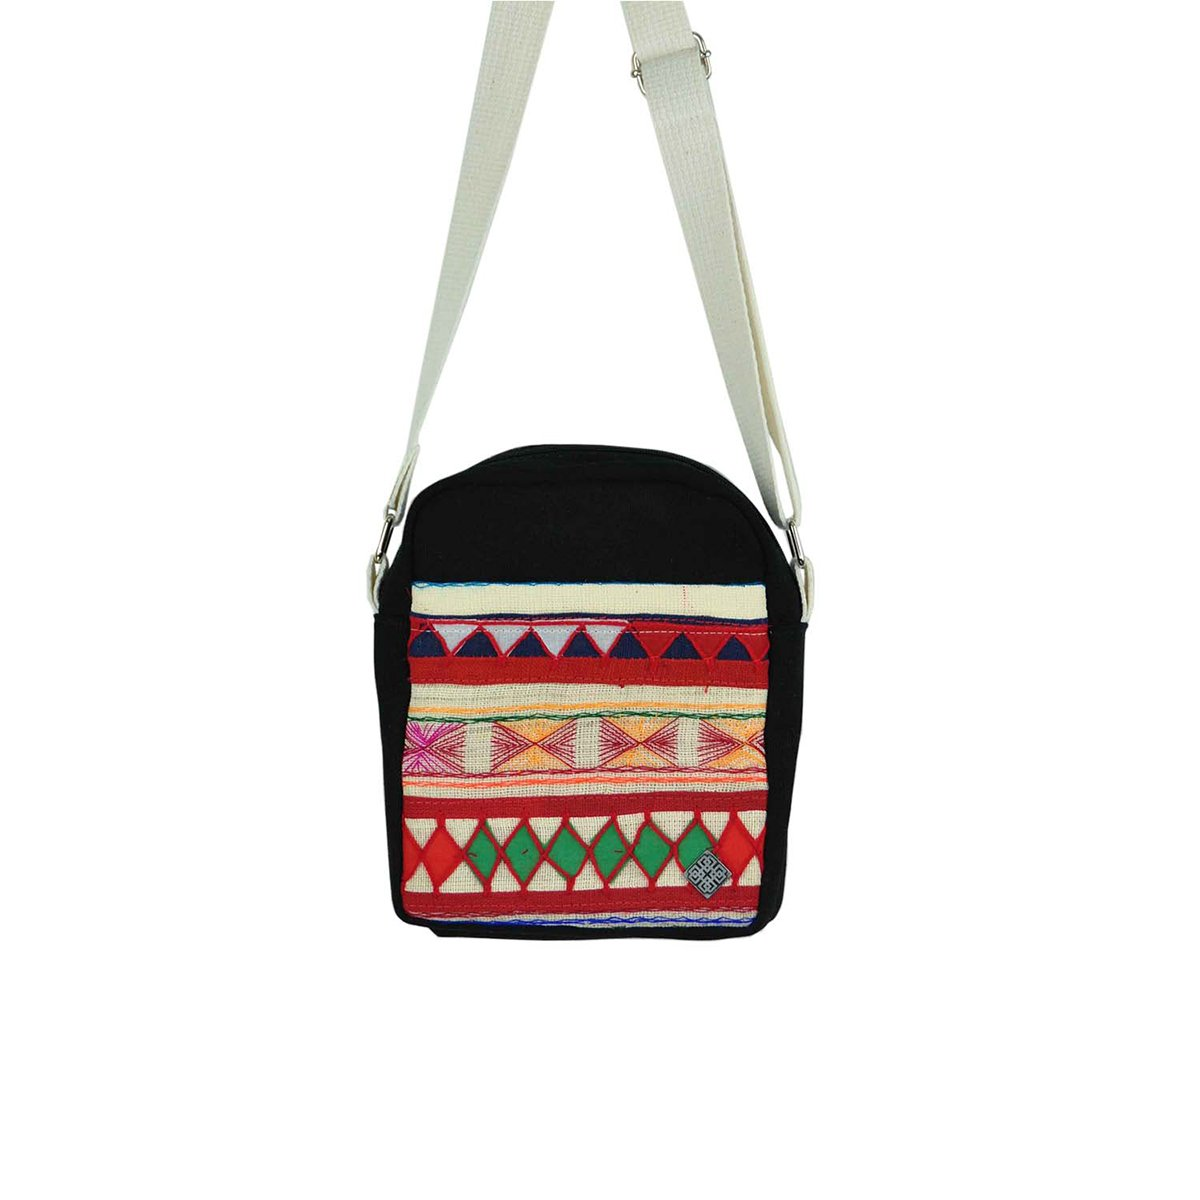 77a3e647bae6 Amazon.com: virblatt small shoulder bag for men and women with hand ...